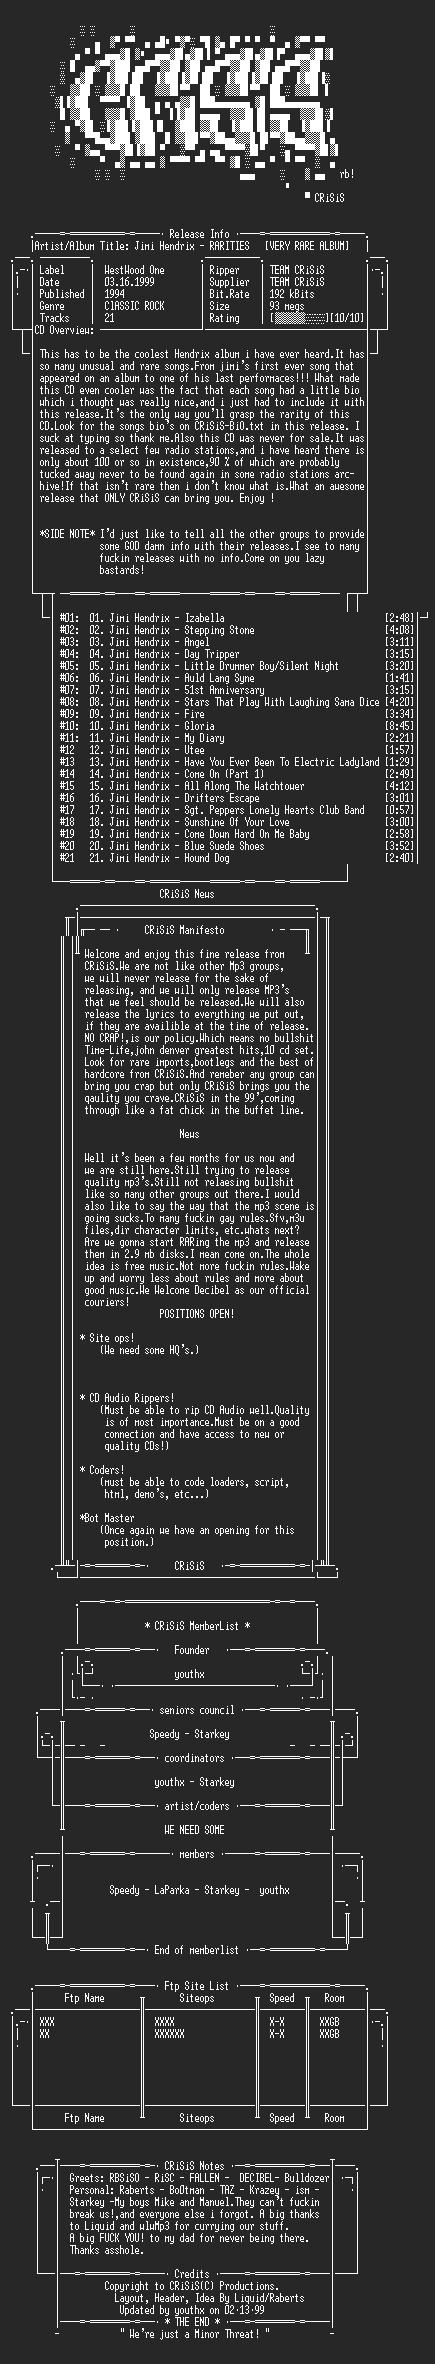 NFO file for Jimi_Hendrix_-_Rarities_-_(VERY_RARE_ALBUM)_-_(1994)_-_CRiSiS